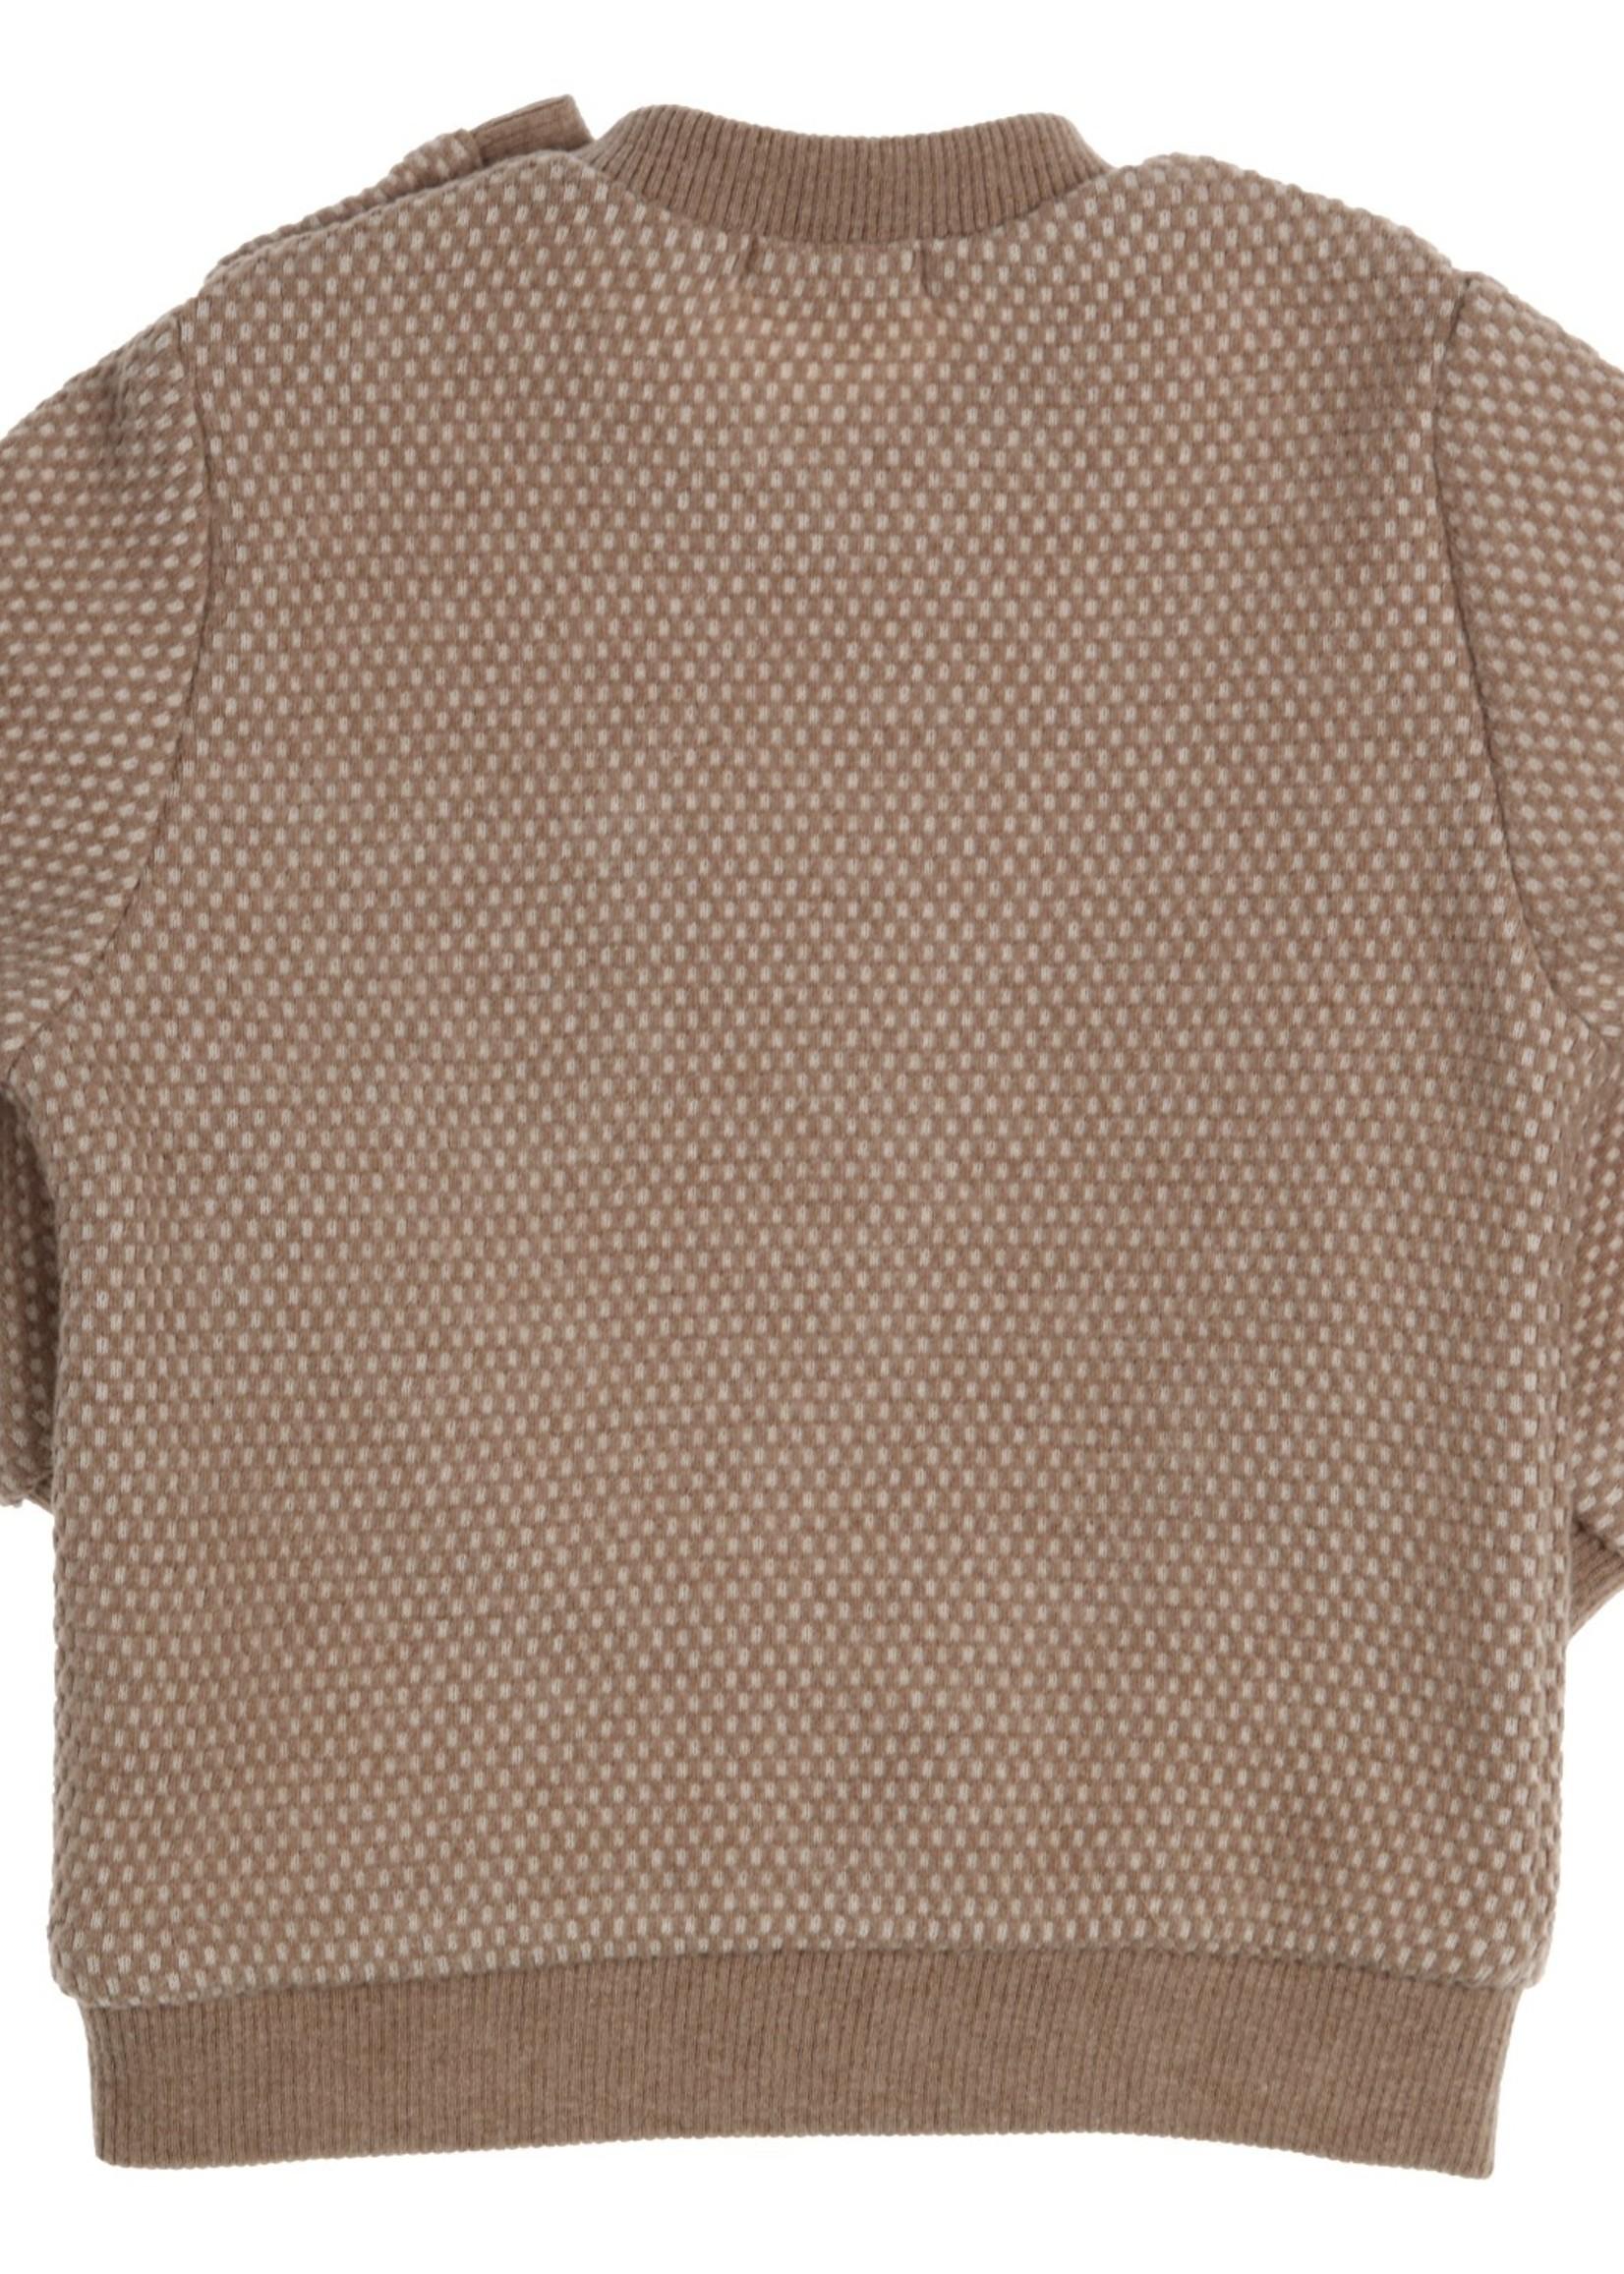 Gymp Gymp sweater beige